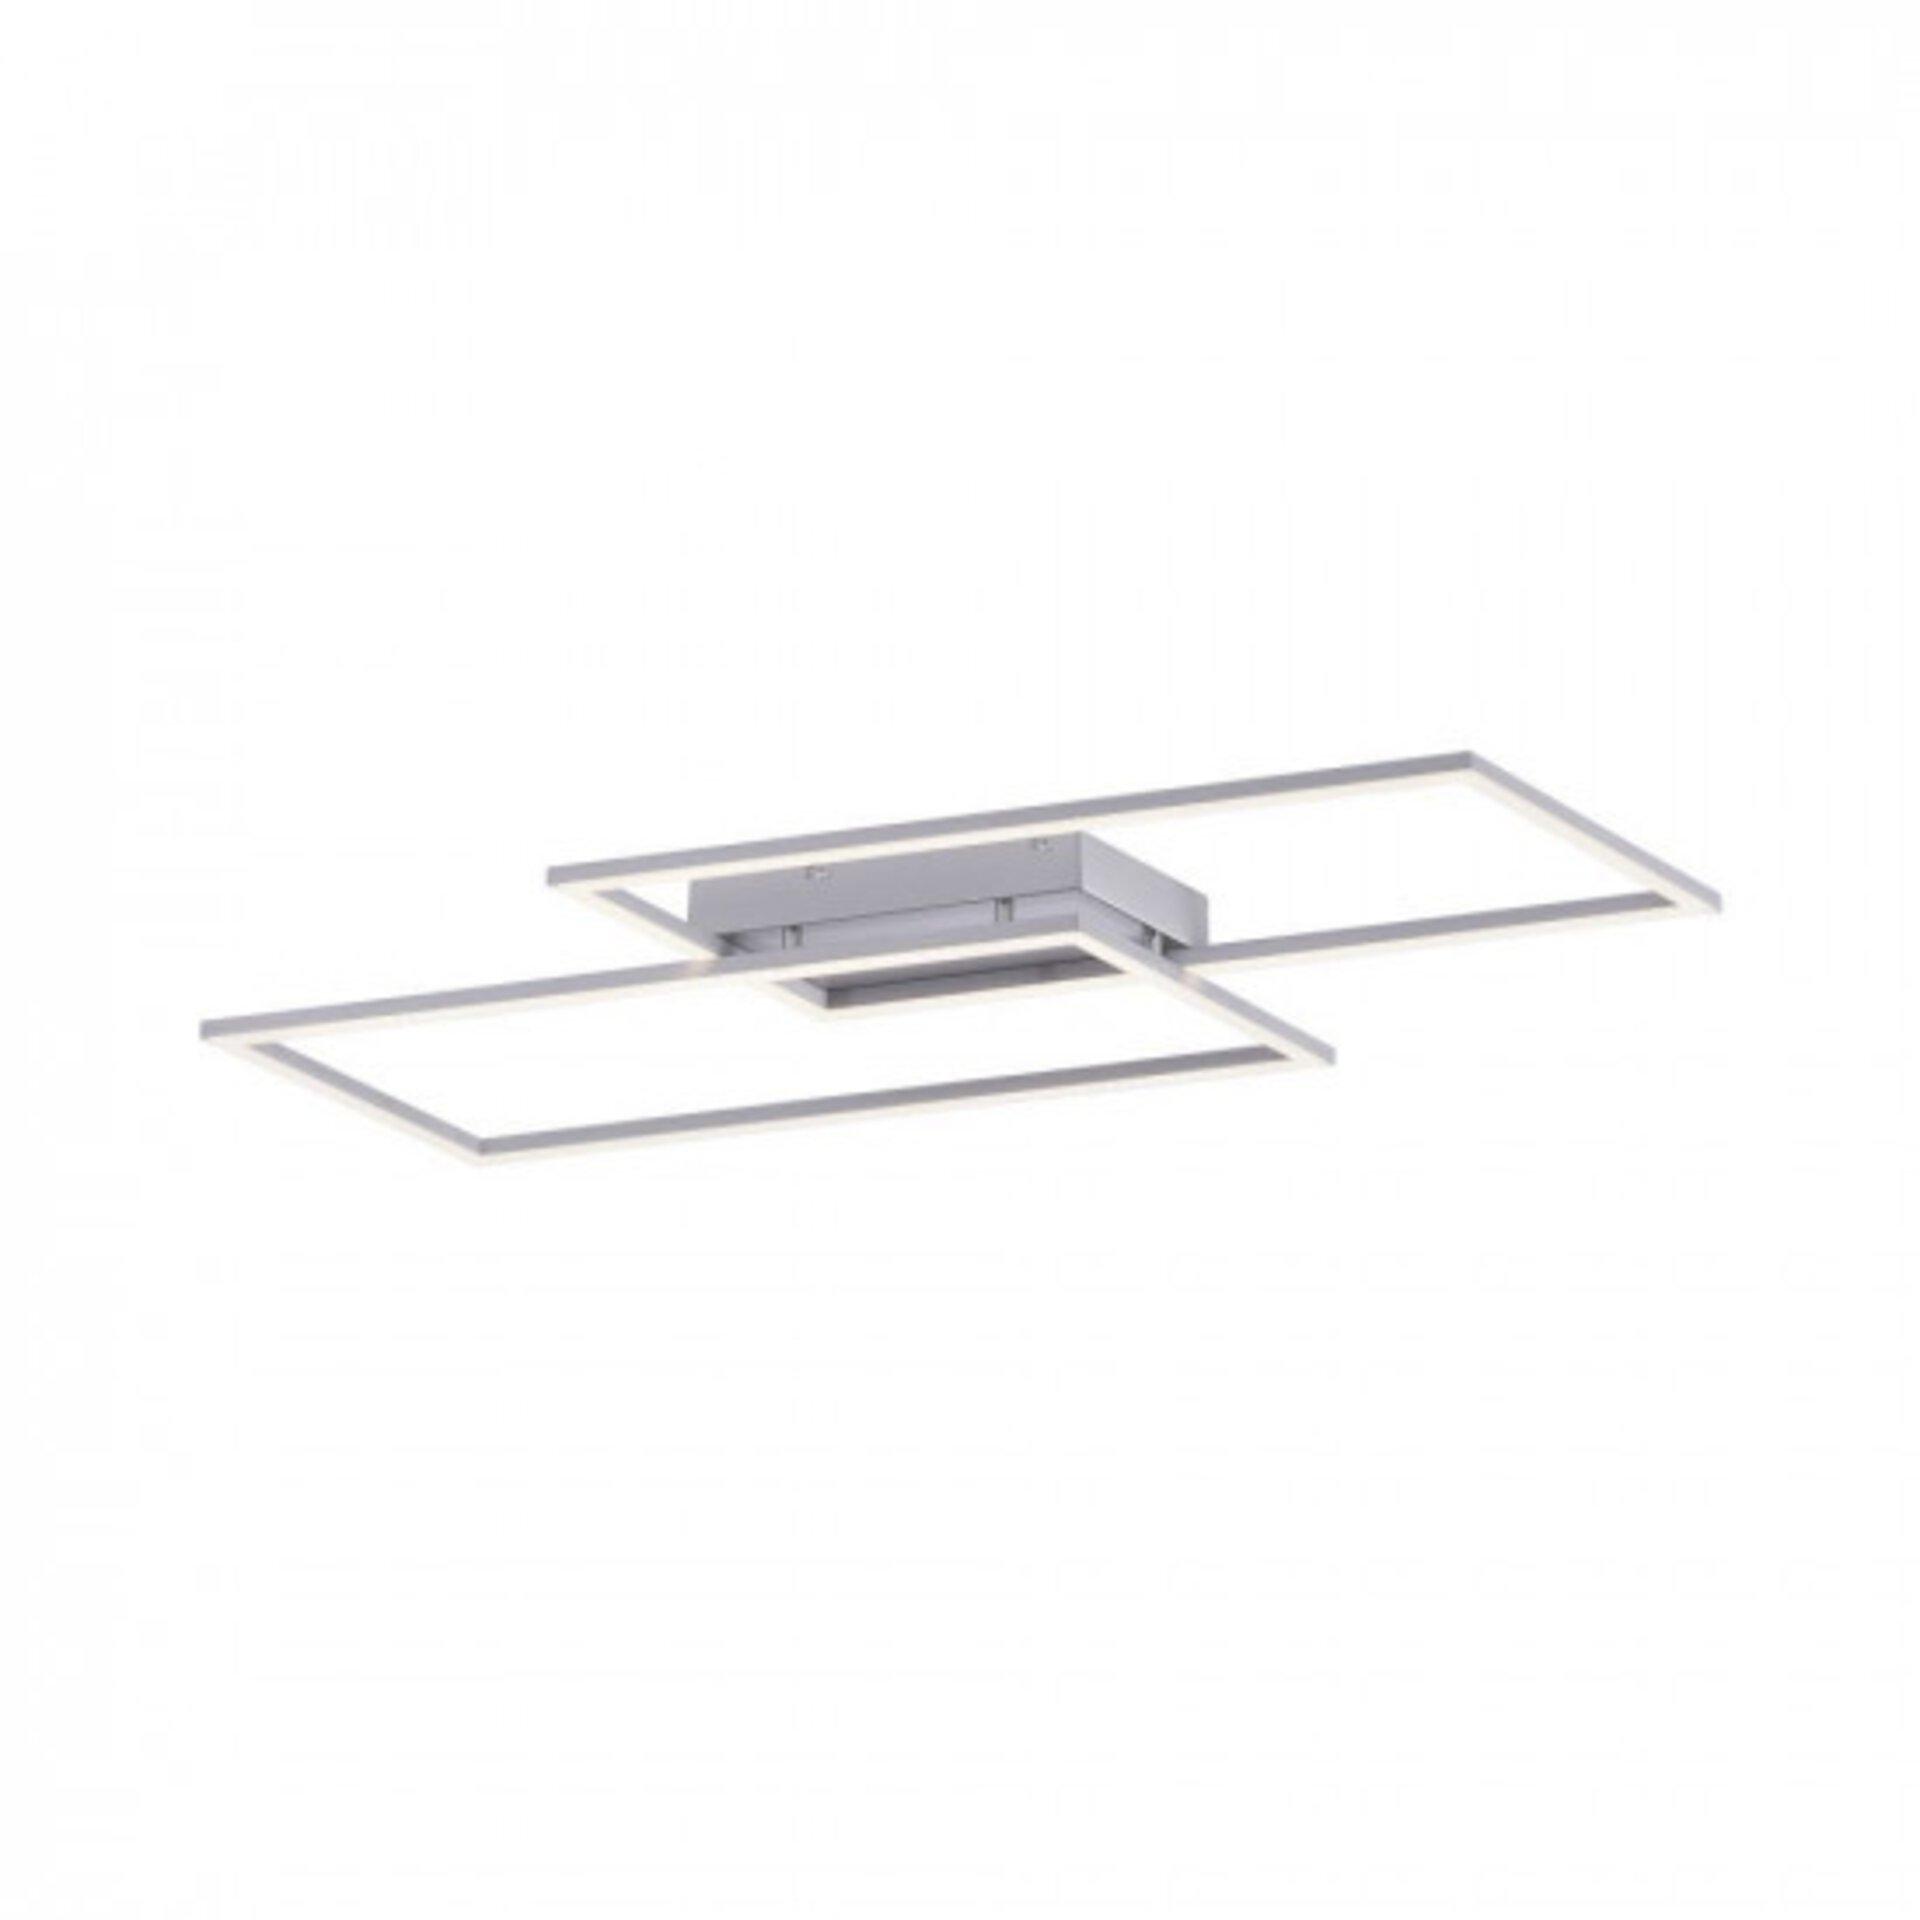 Deckenleuchte INIGO Paul Neuhaus Metall silber 24 x 7 x 84 cm